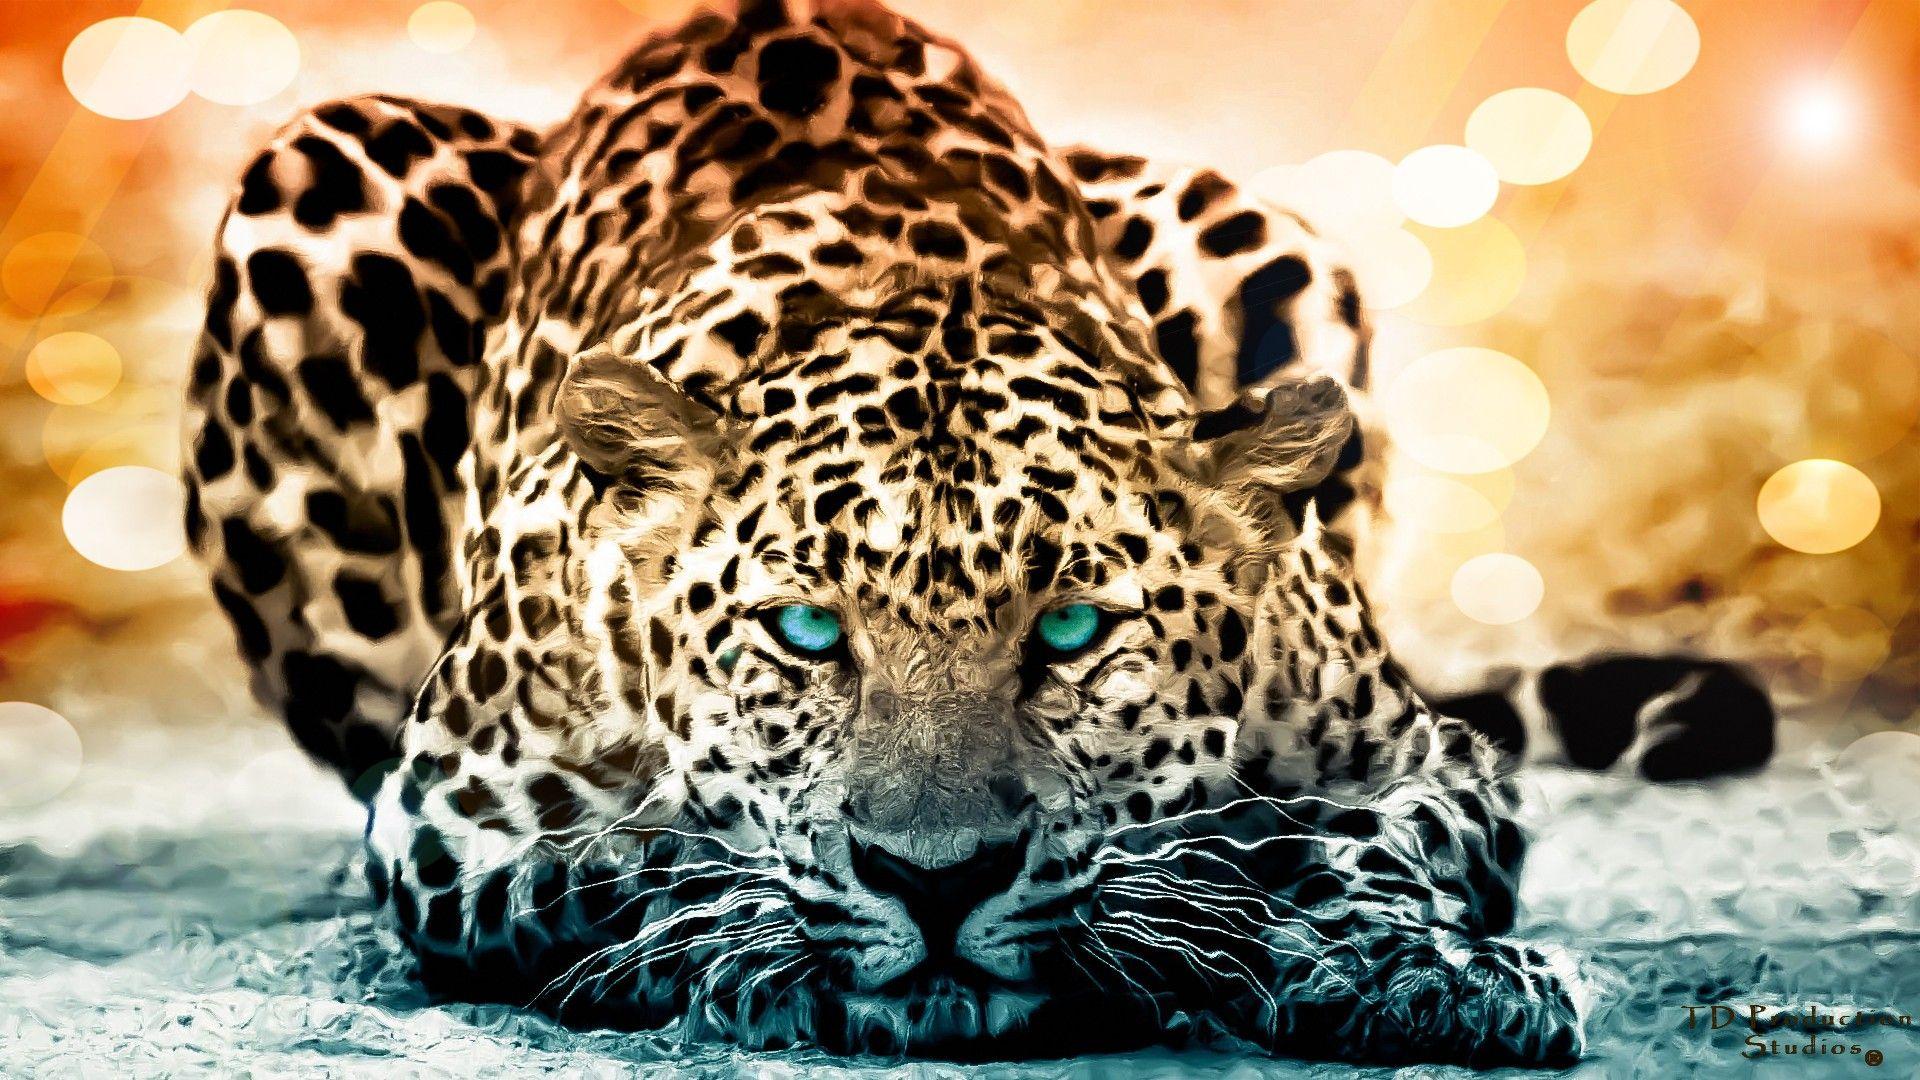 jaguar animal - Google Search | A11 Big Cats - Best Picture ...